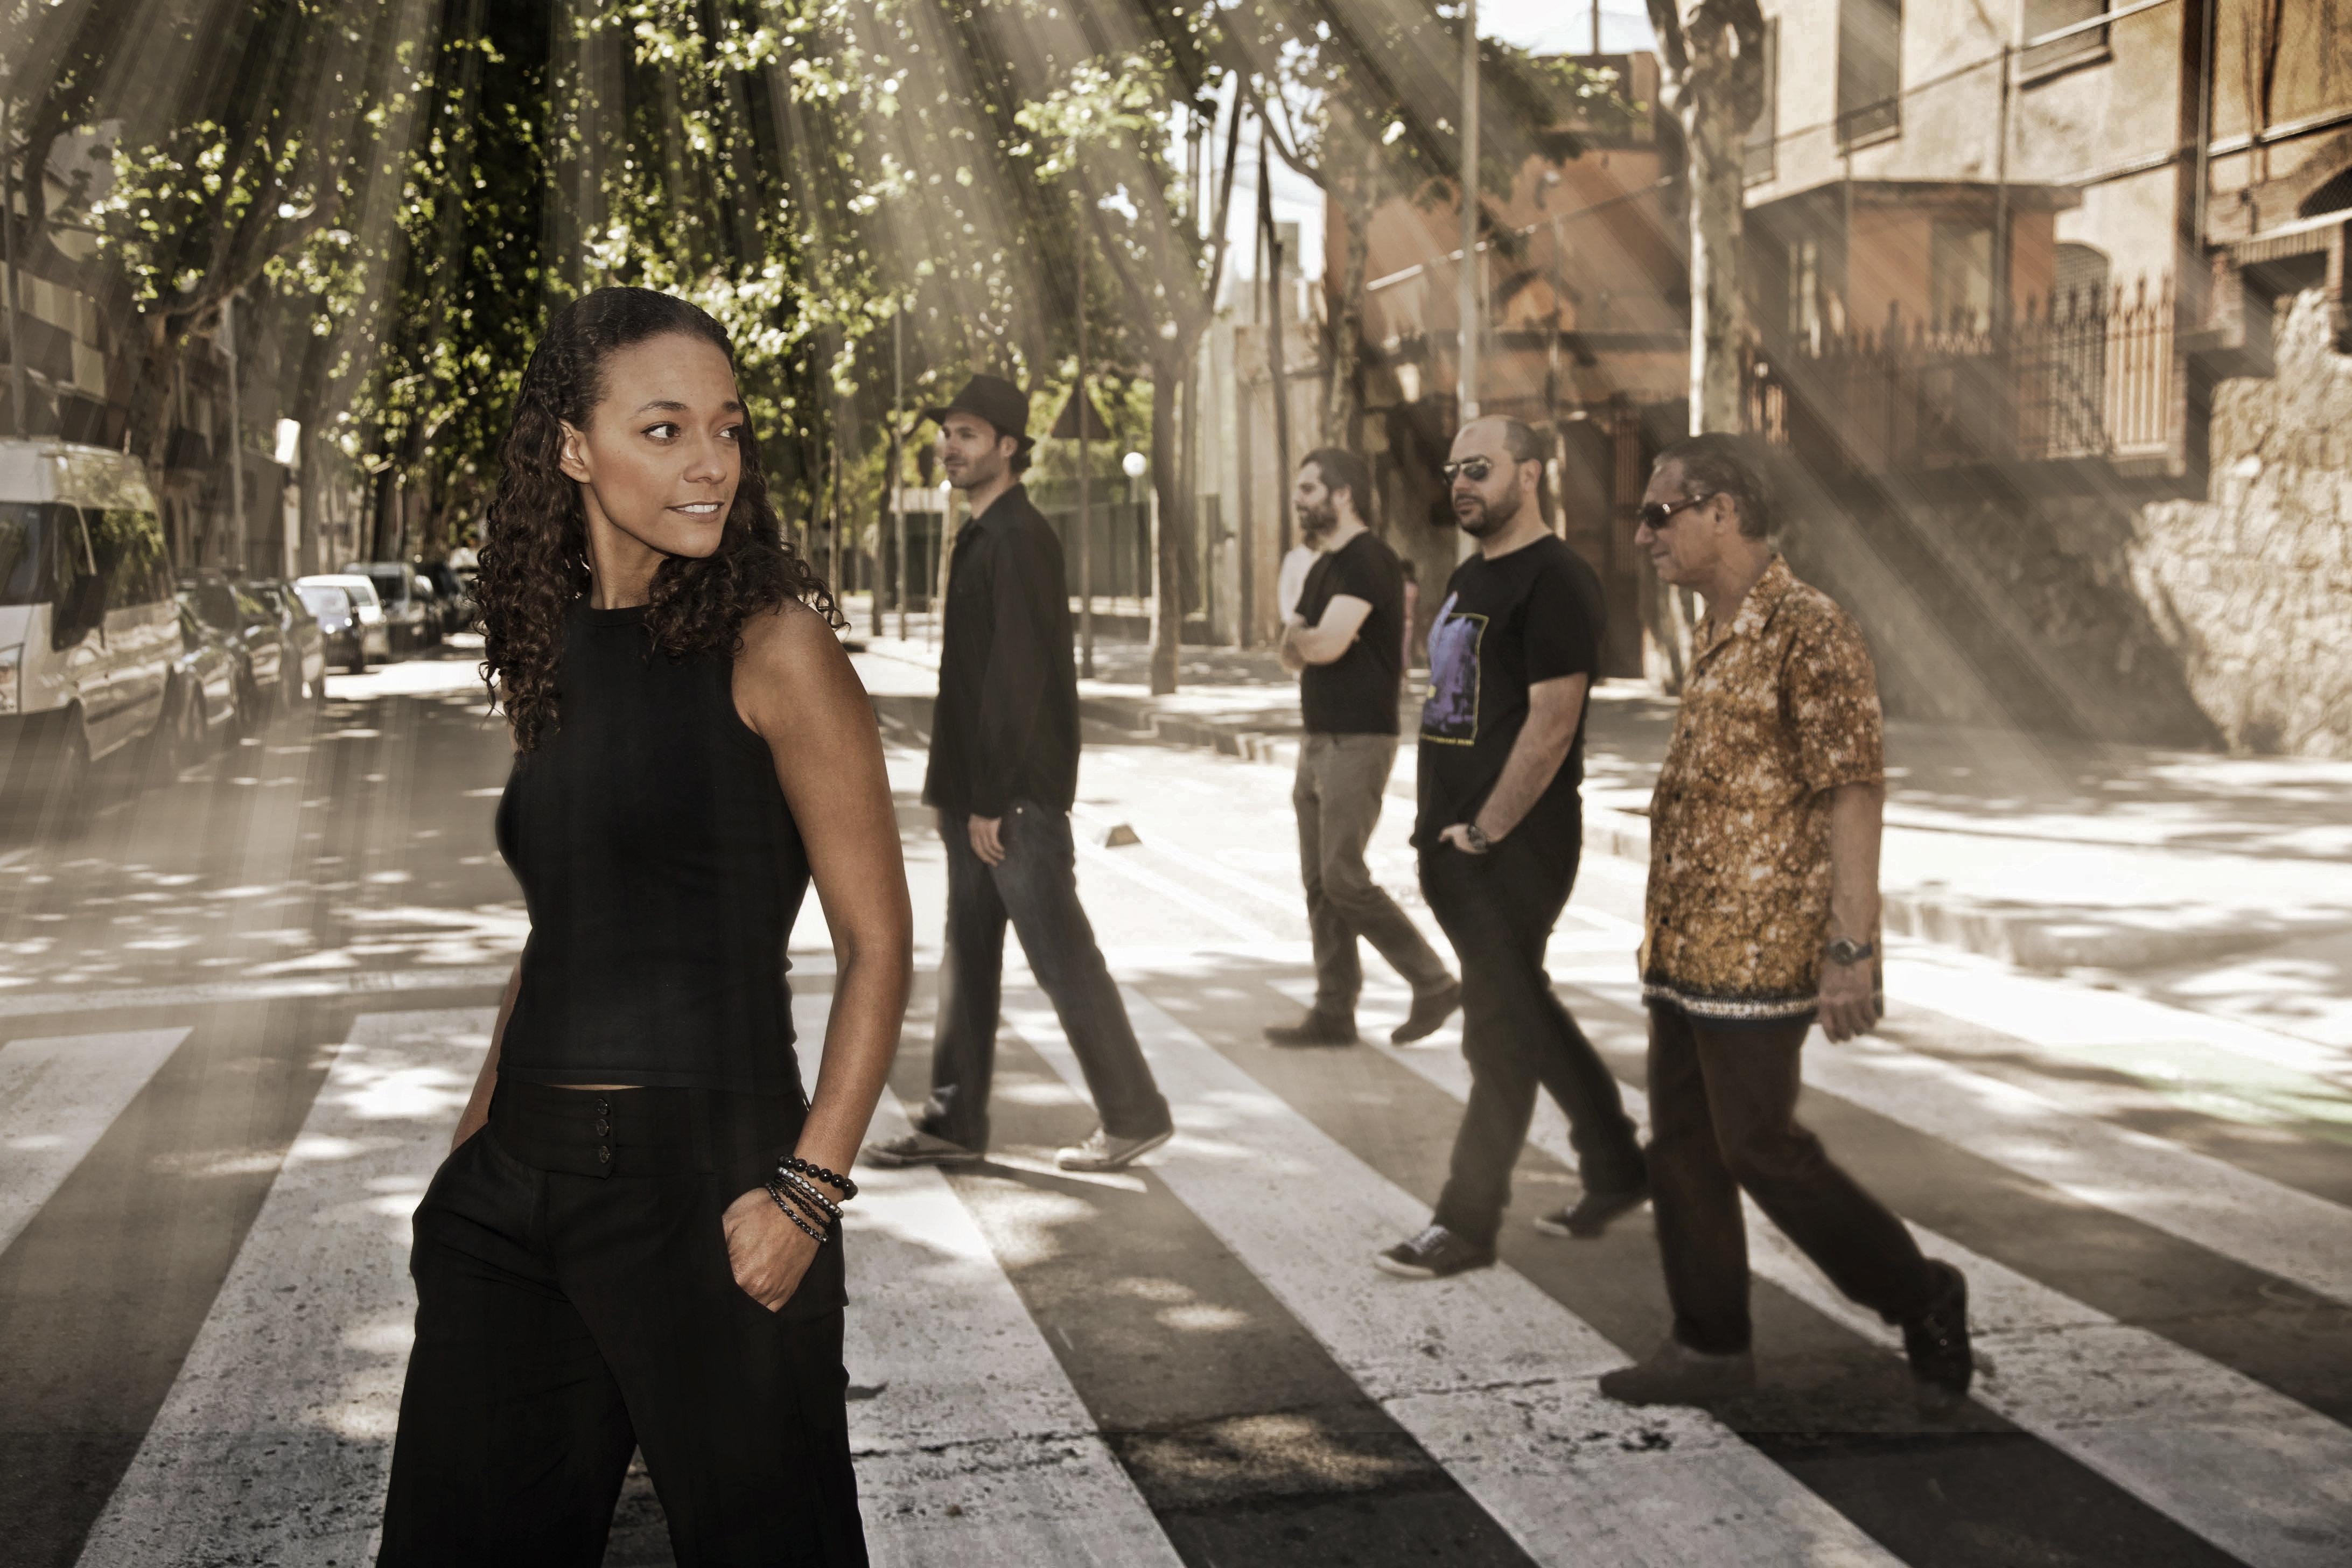 Blues band musicians posing at street.